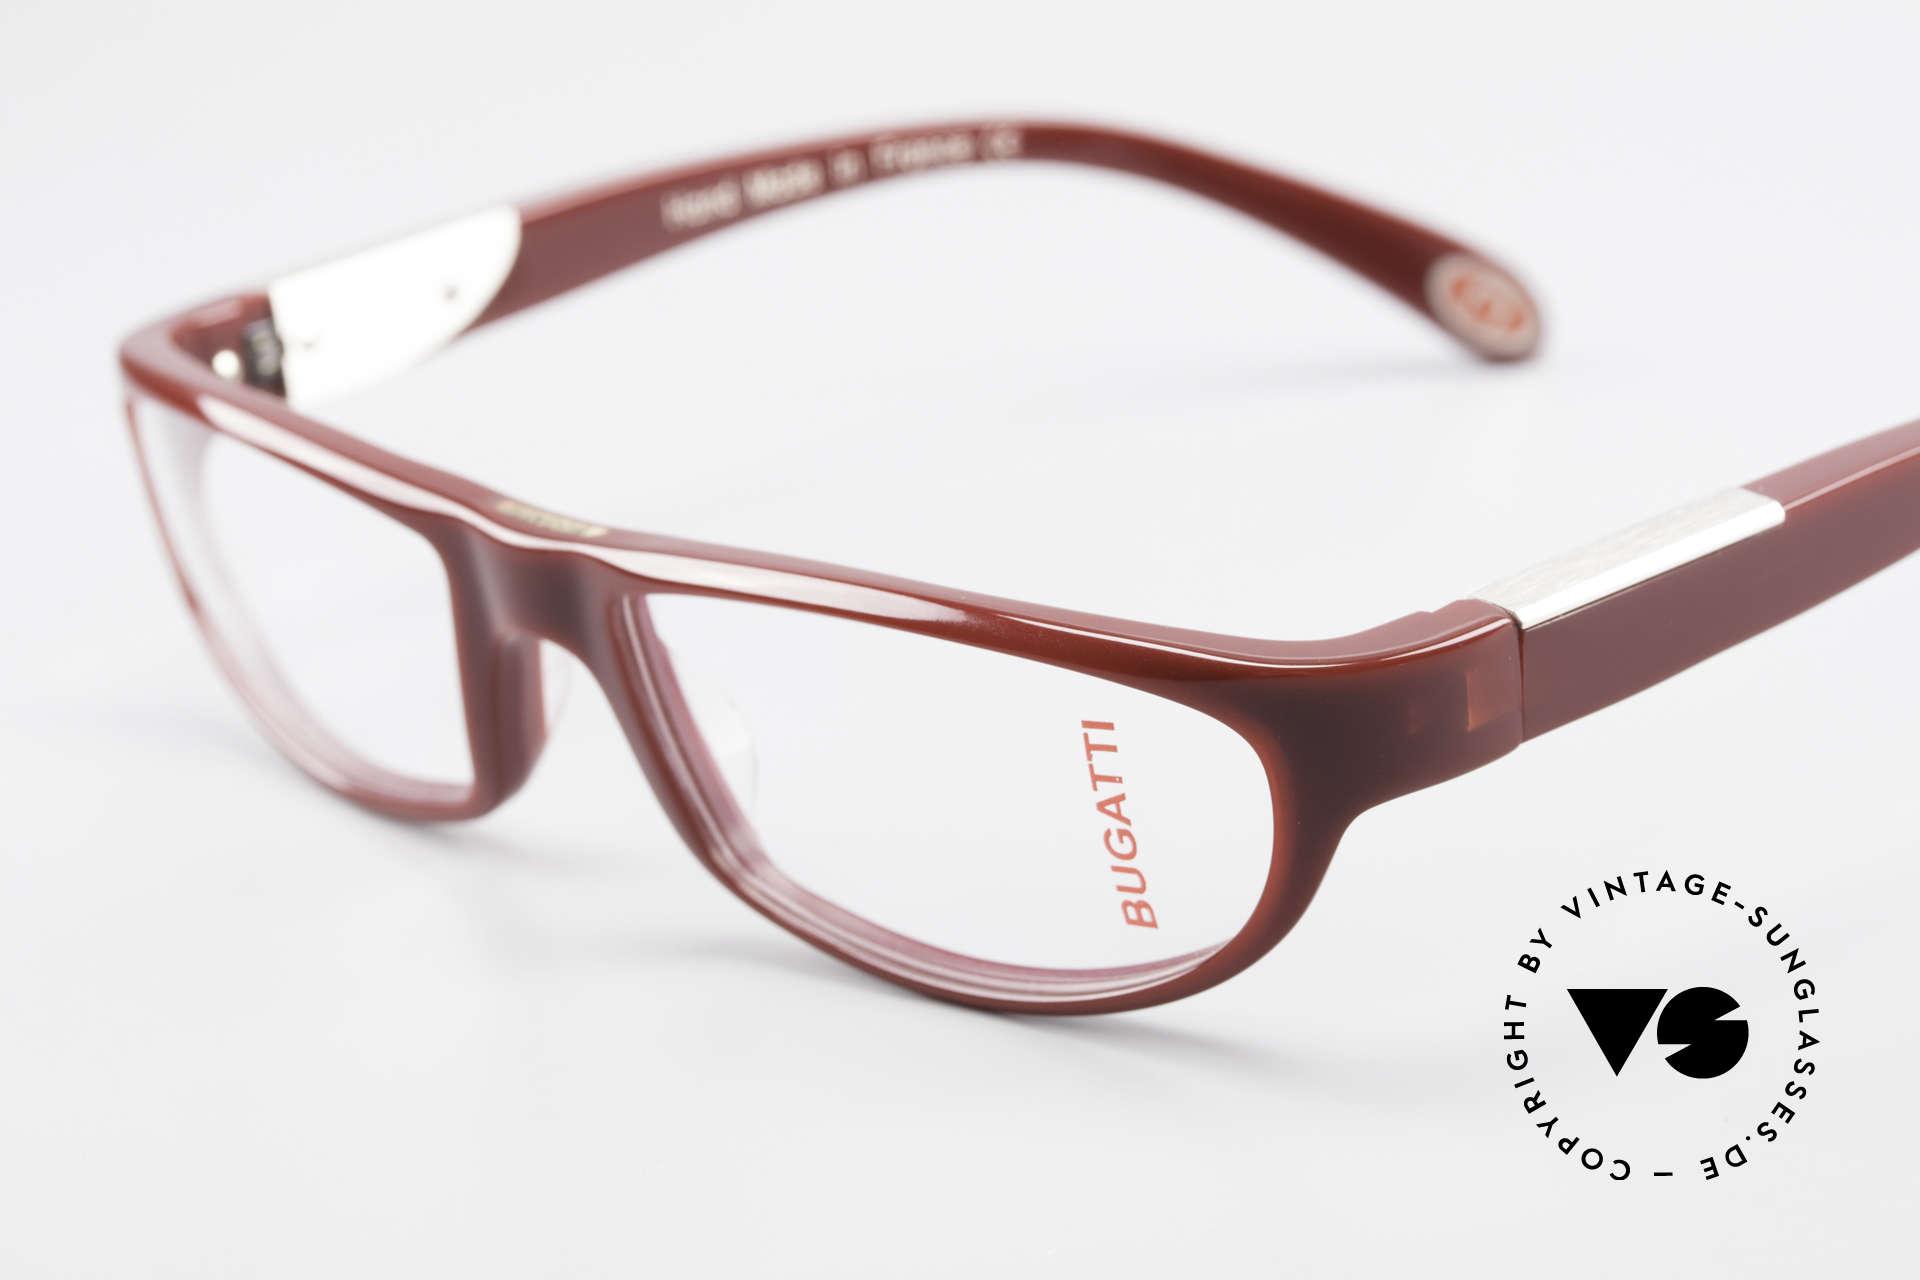 Bugatti 534 Striking Plastic Eyeglass-Frame, true rarity (limited-lot production by Bugatti), Made for Men